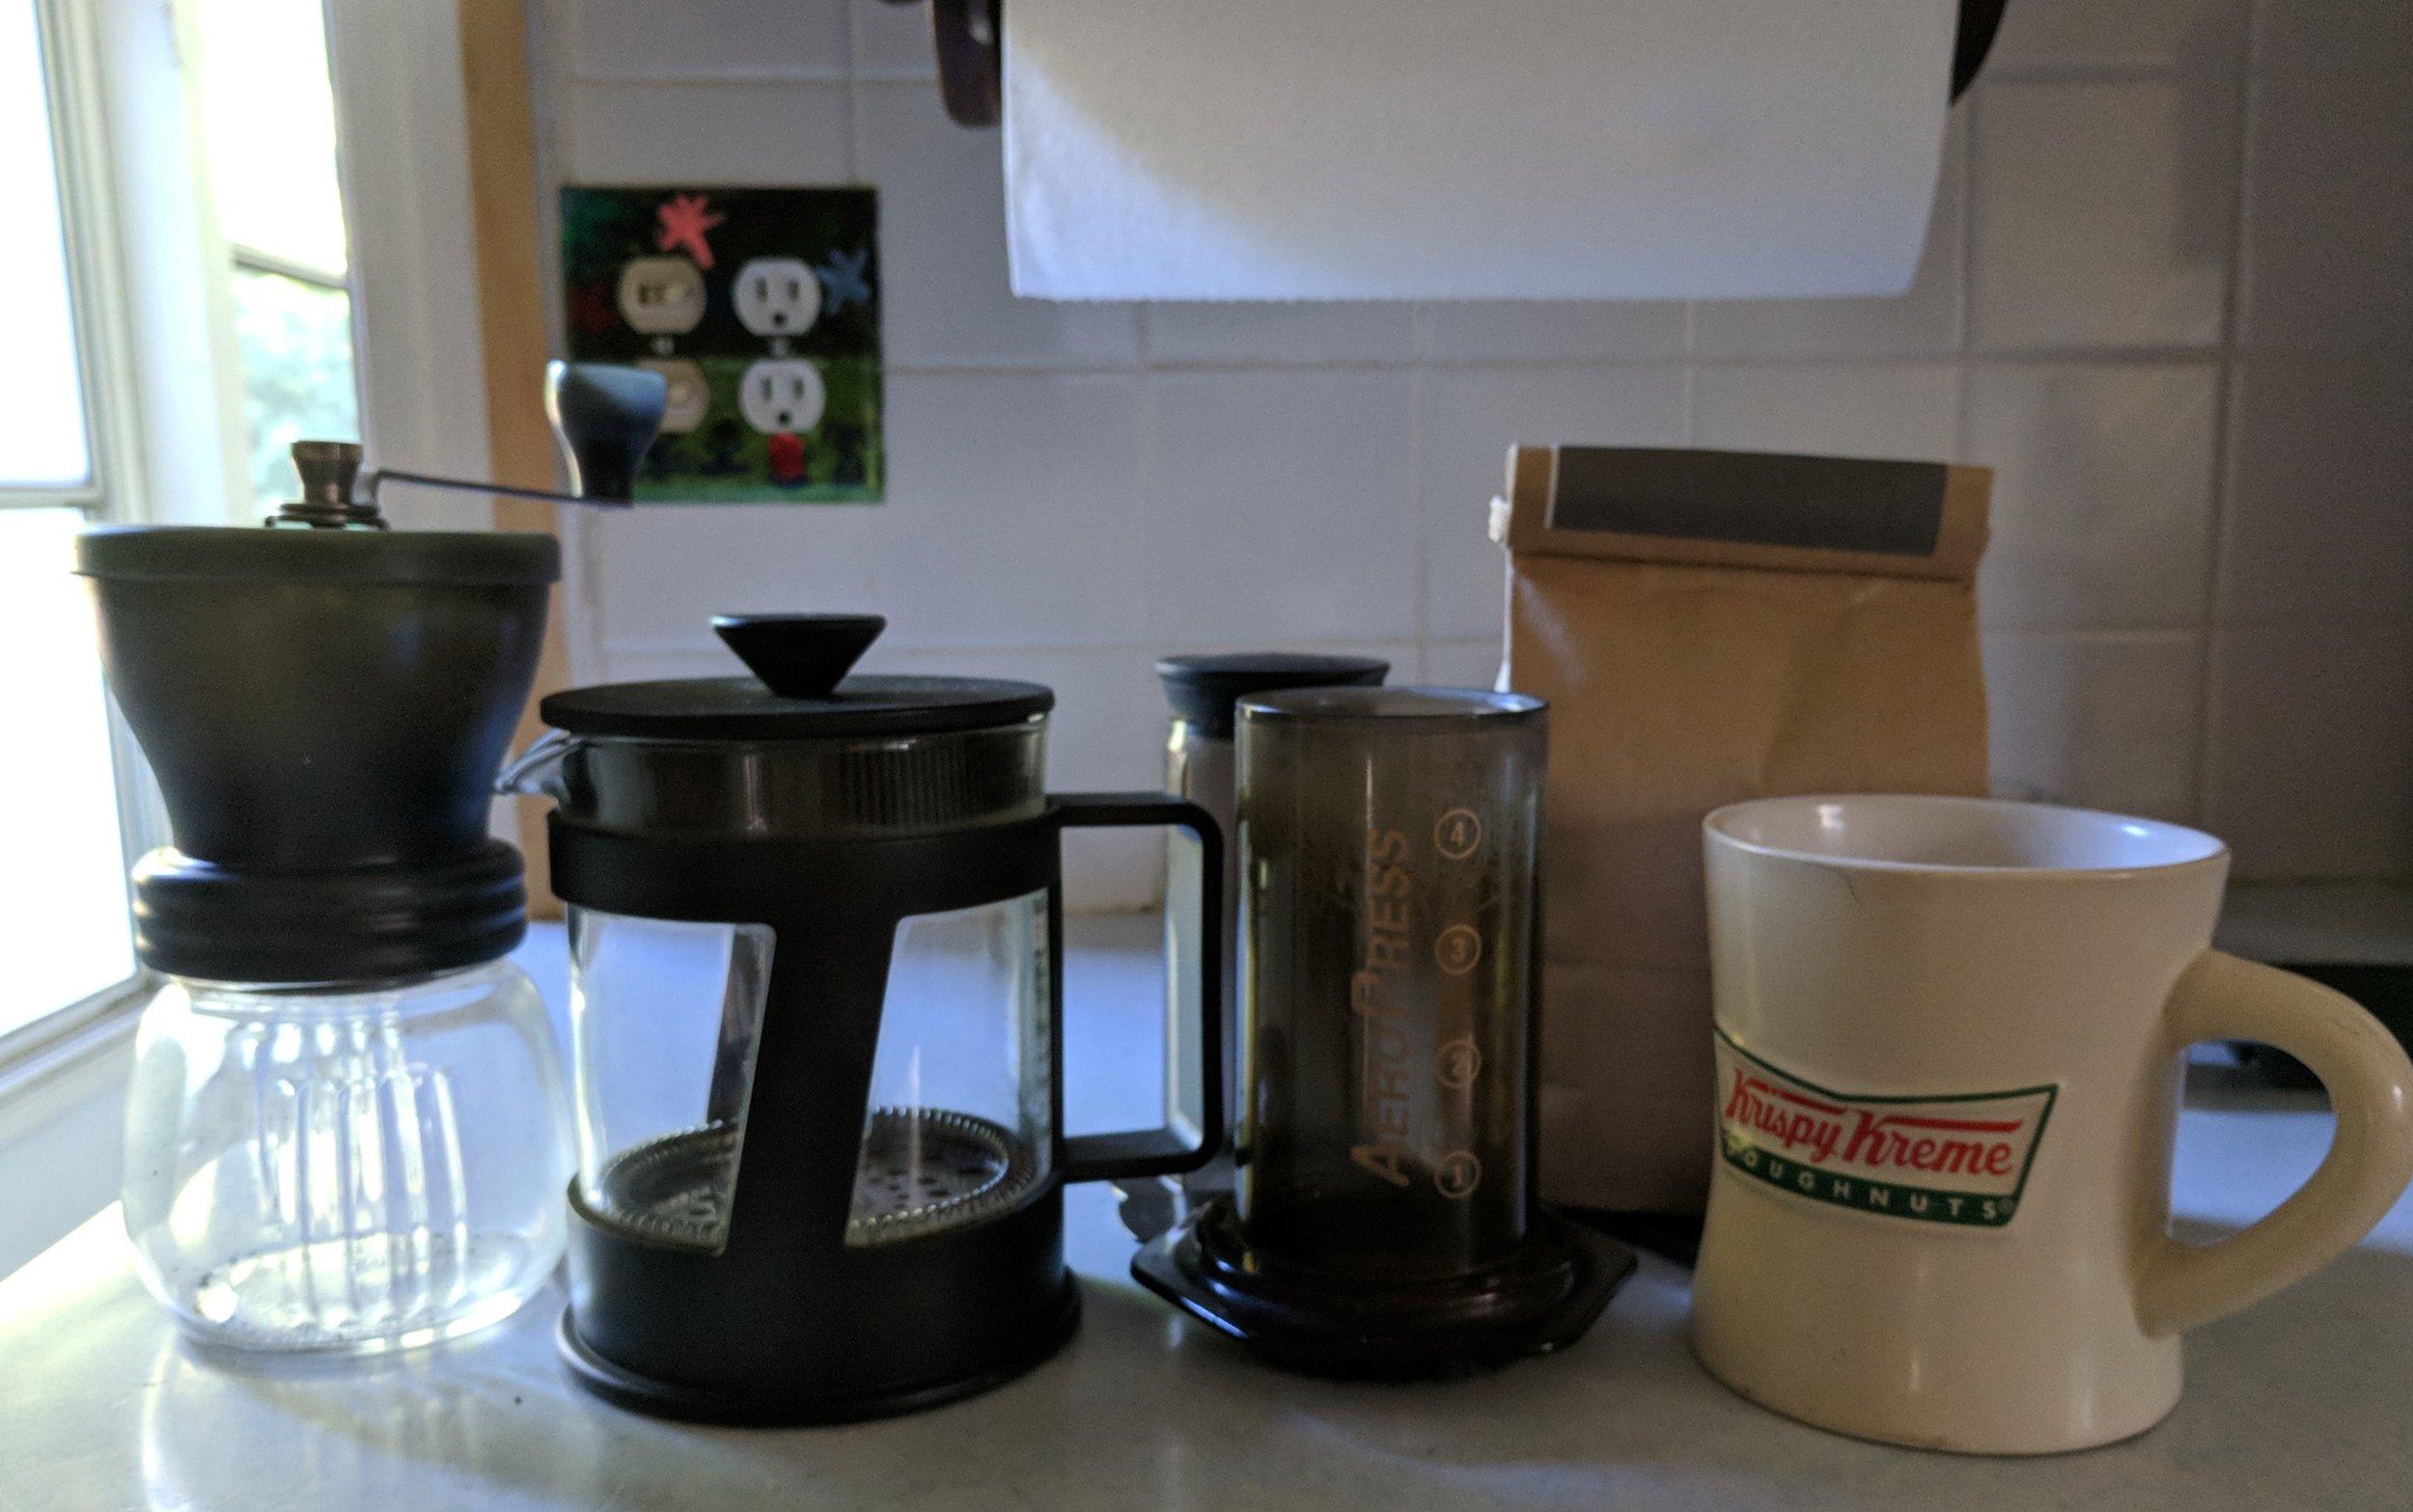 Grinder, french press, Aeropress, good beans, and a mug. Just add hot water.